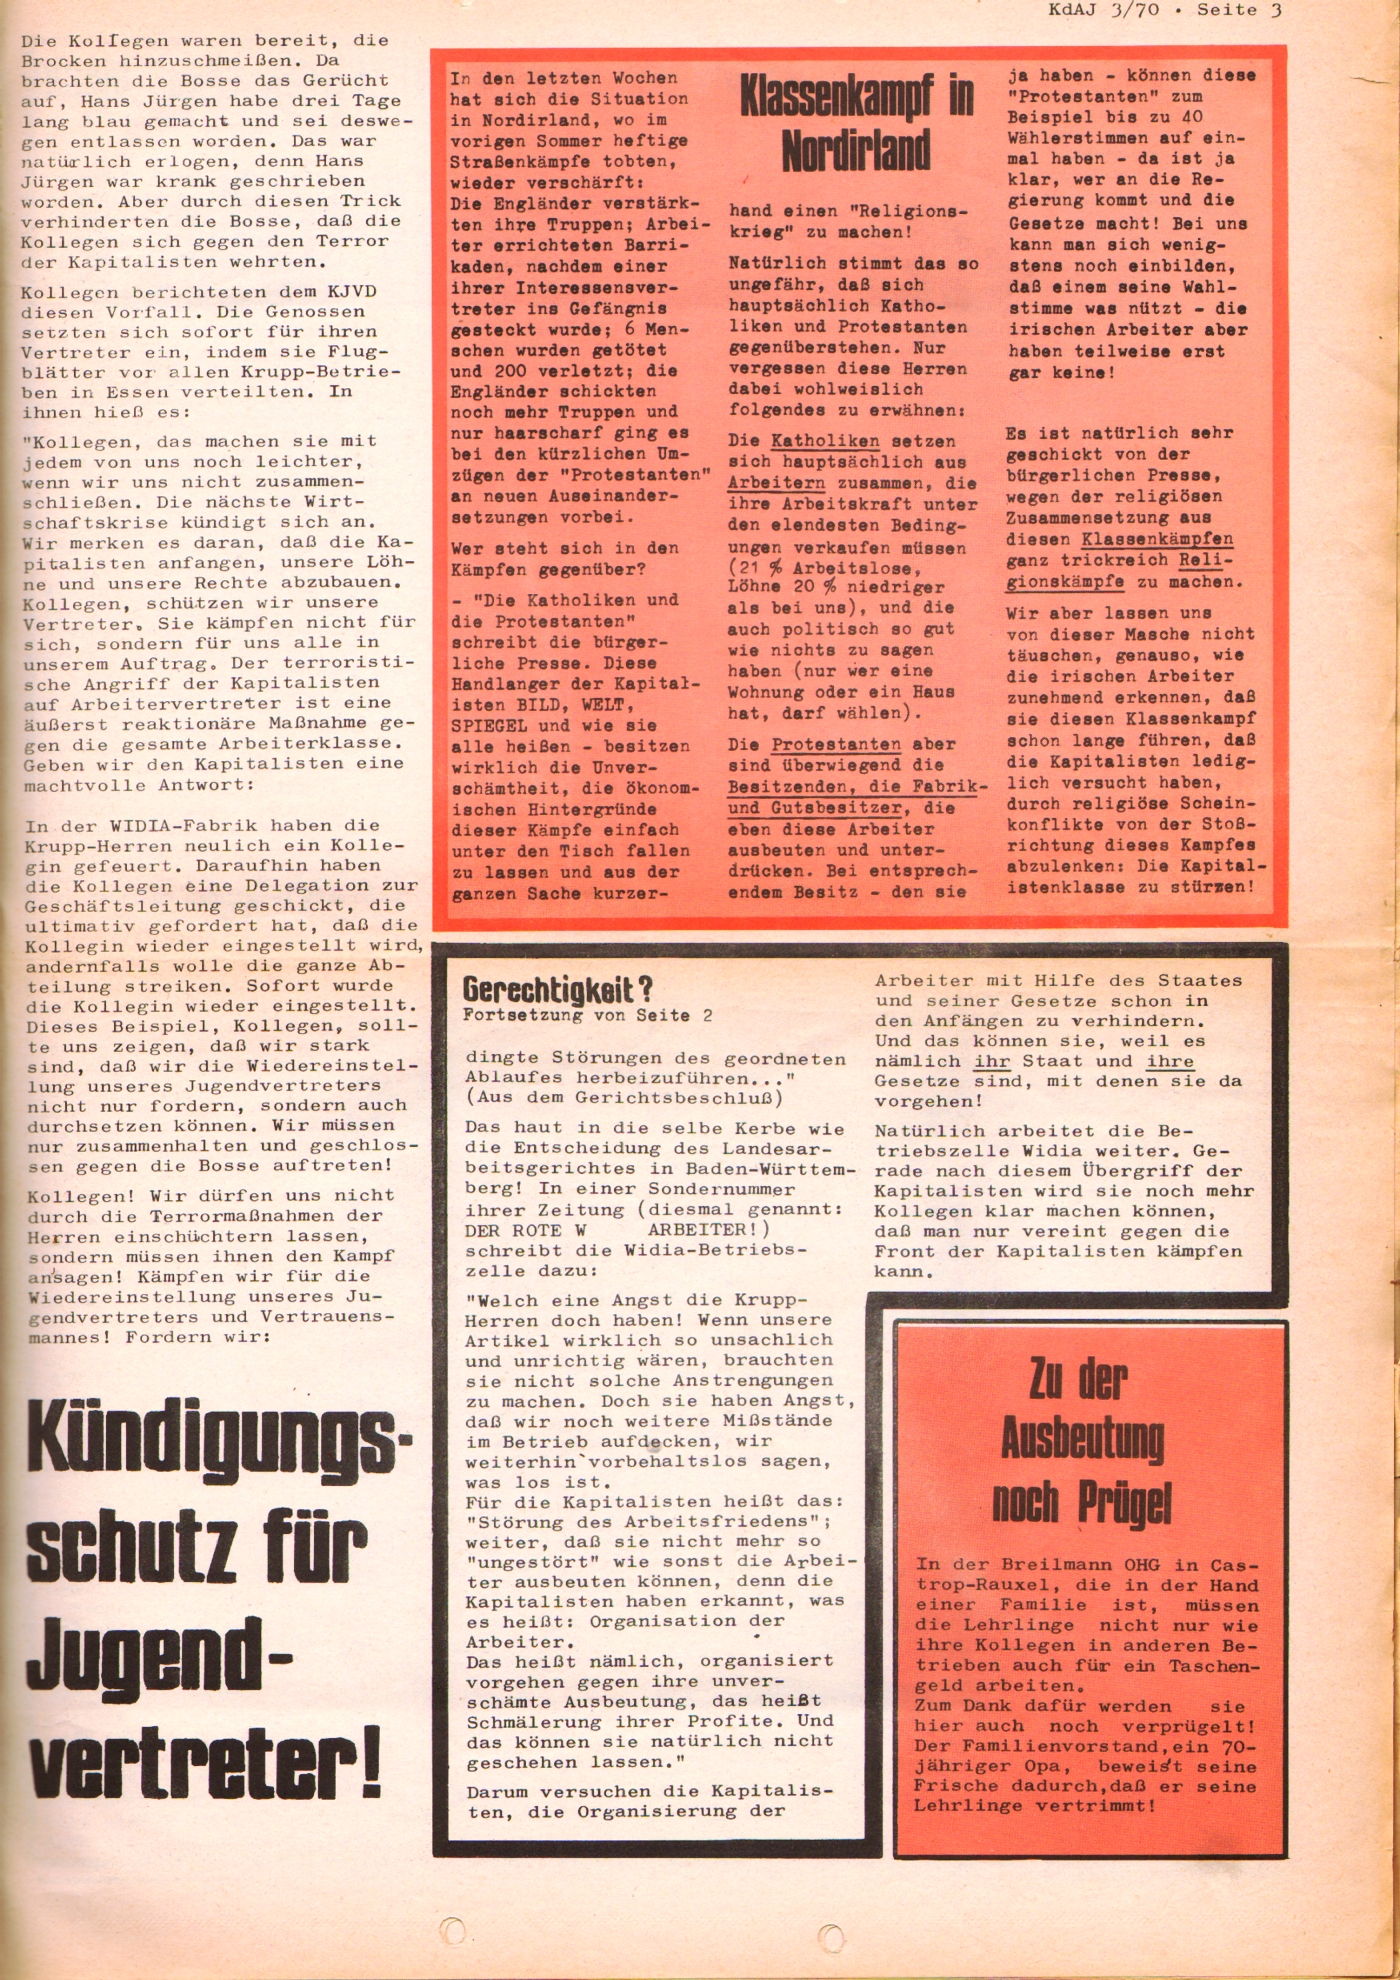 KDAJ, 1. Jg., August 1970, Nr. 3, Seite 3